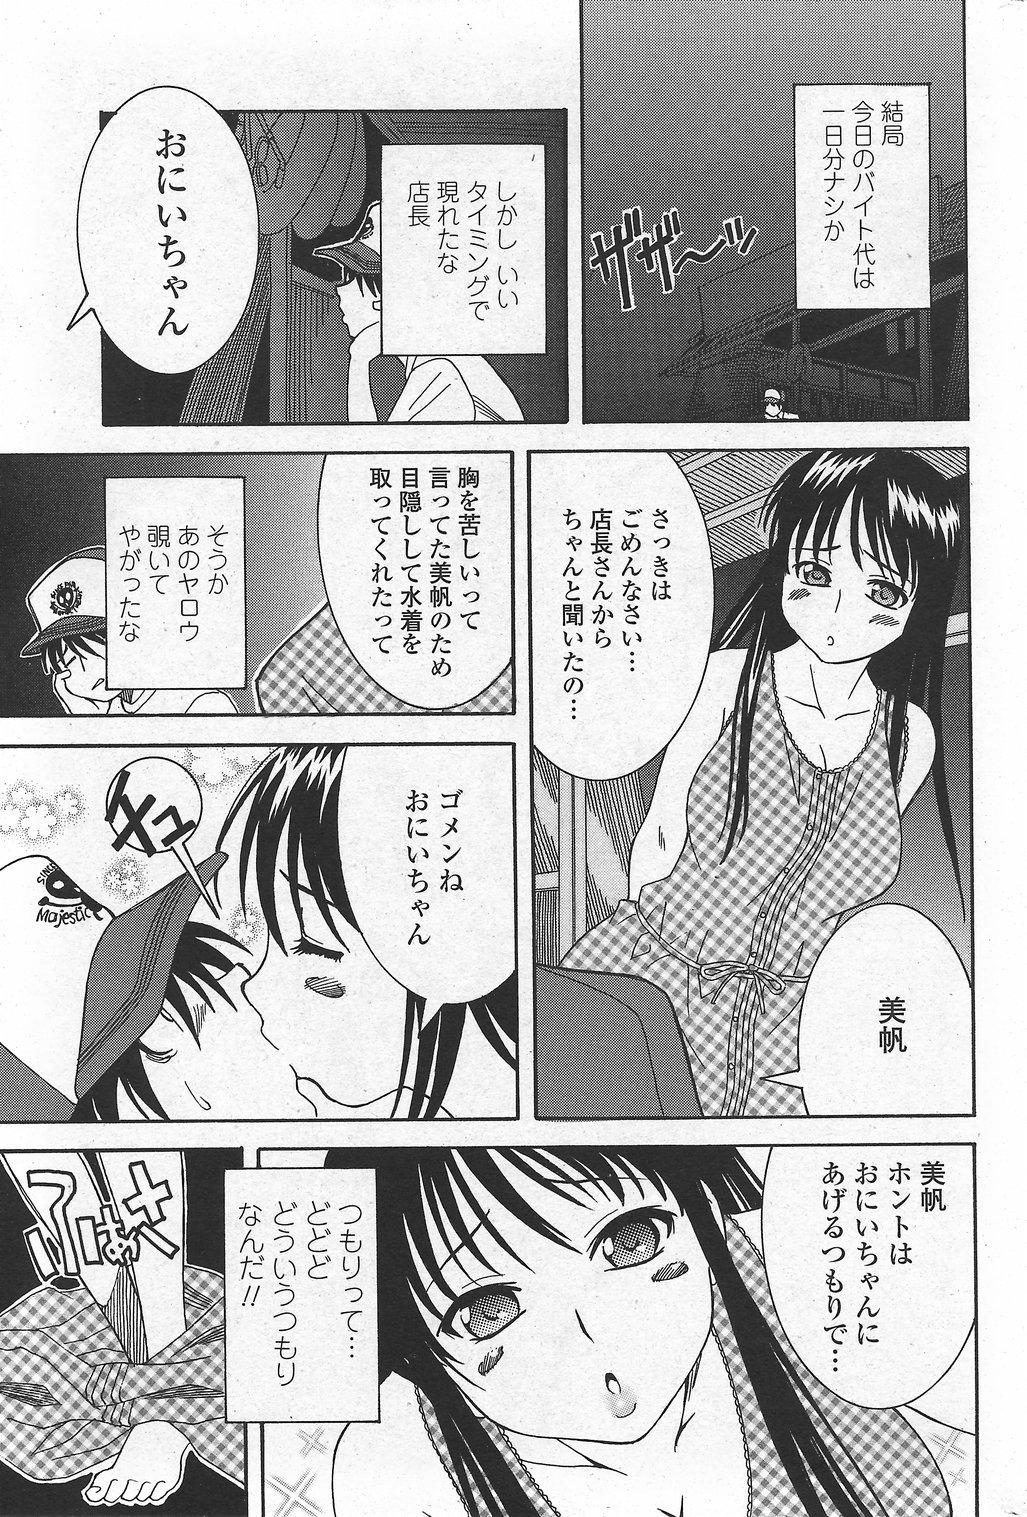 COMIC Penguin Club Sanzokuban 2007-10 Vol. 225 42